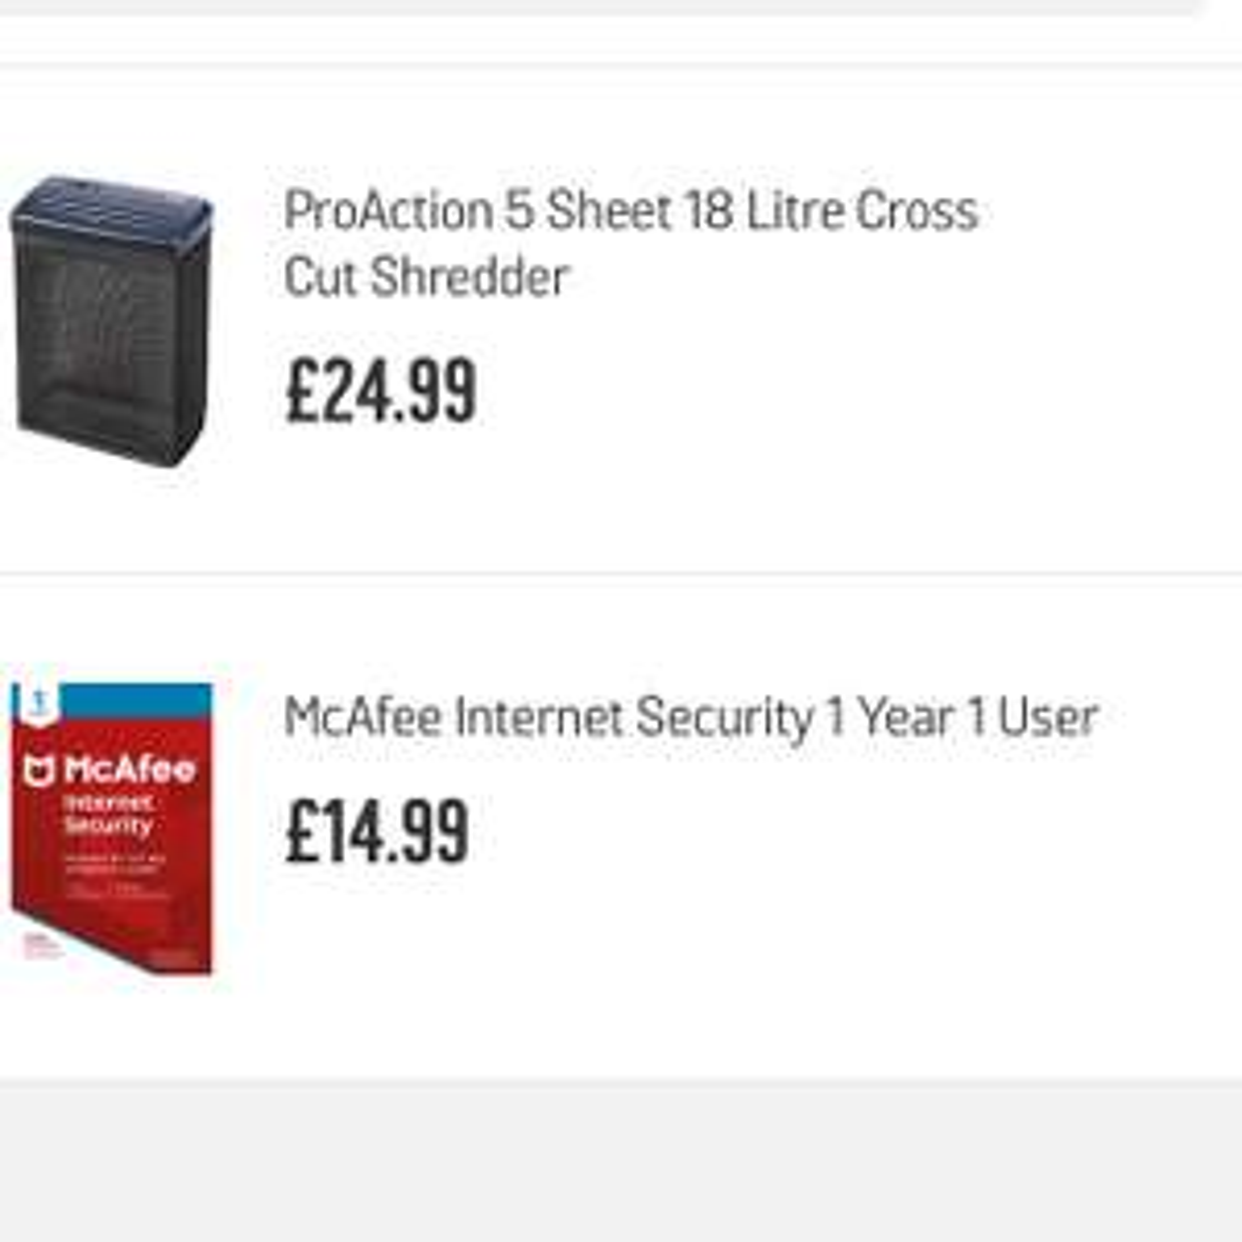 Proactive cross cut shredder £24.99 plus you get £14.99 worth Macfee internet security free @ Argos